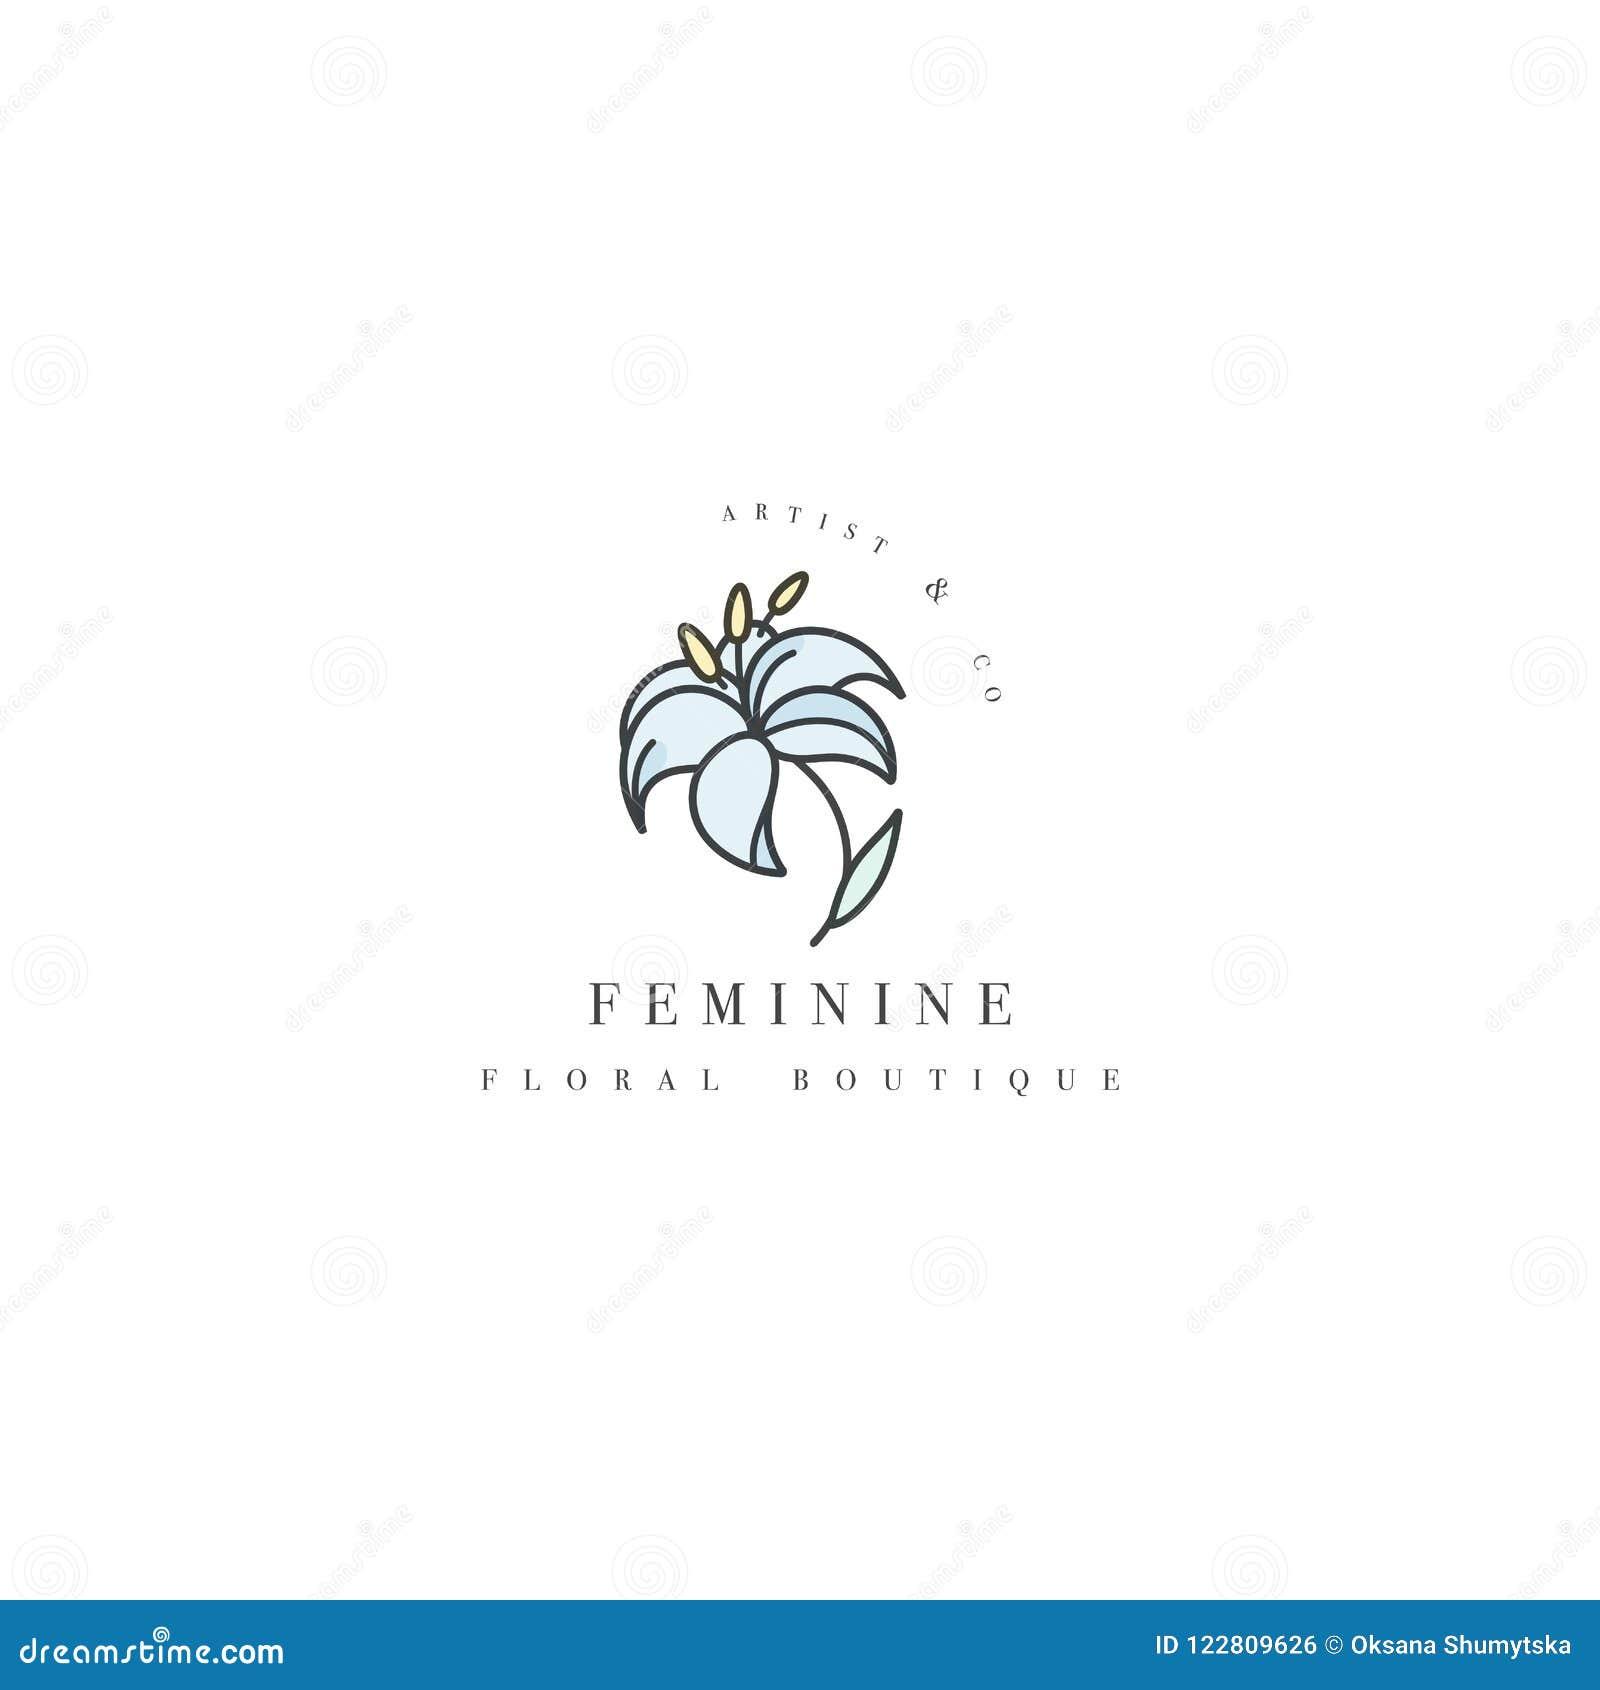 vector template logo or emblem floral boutique lily flower logo